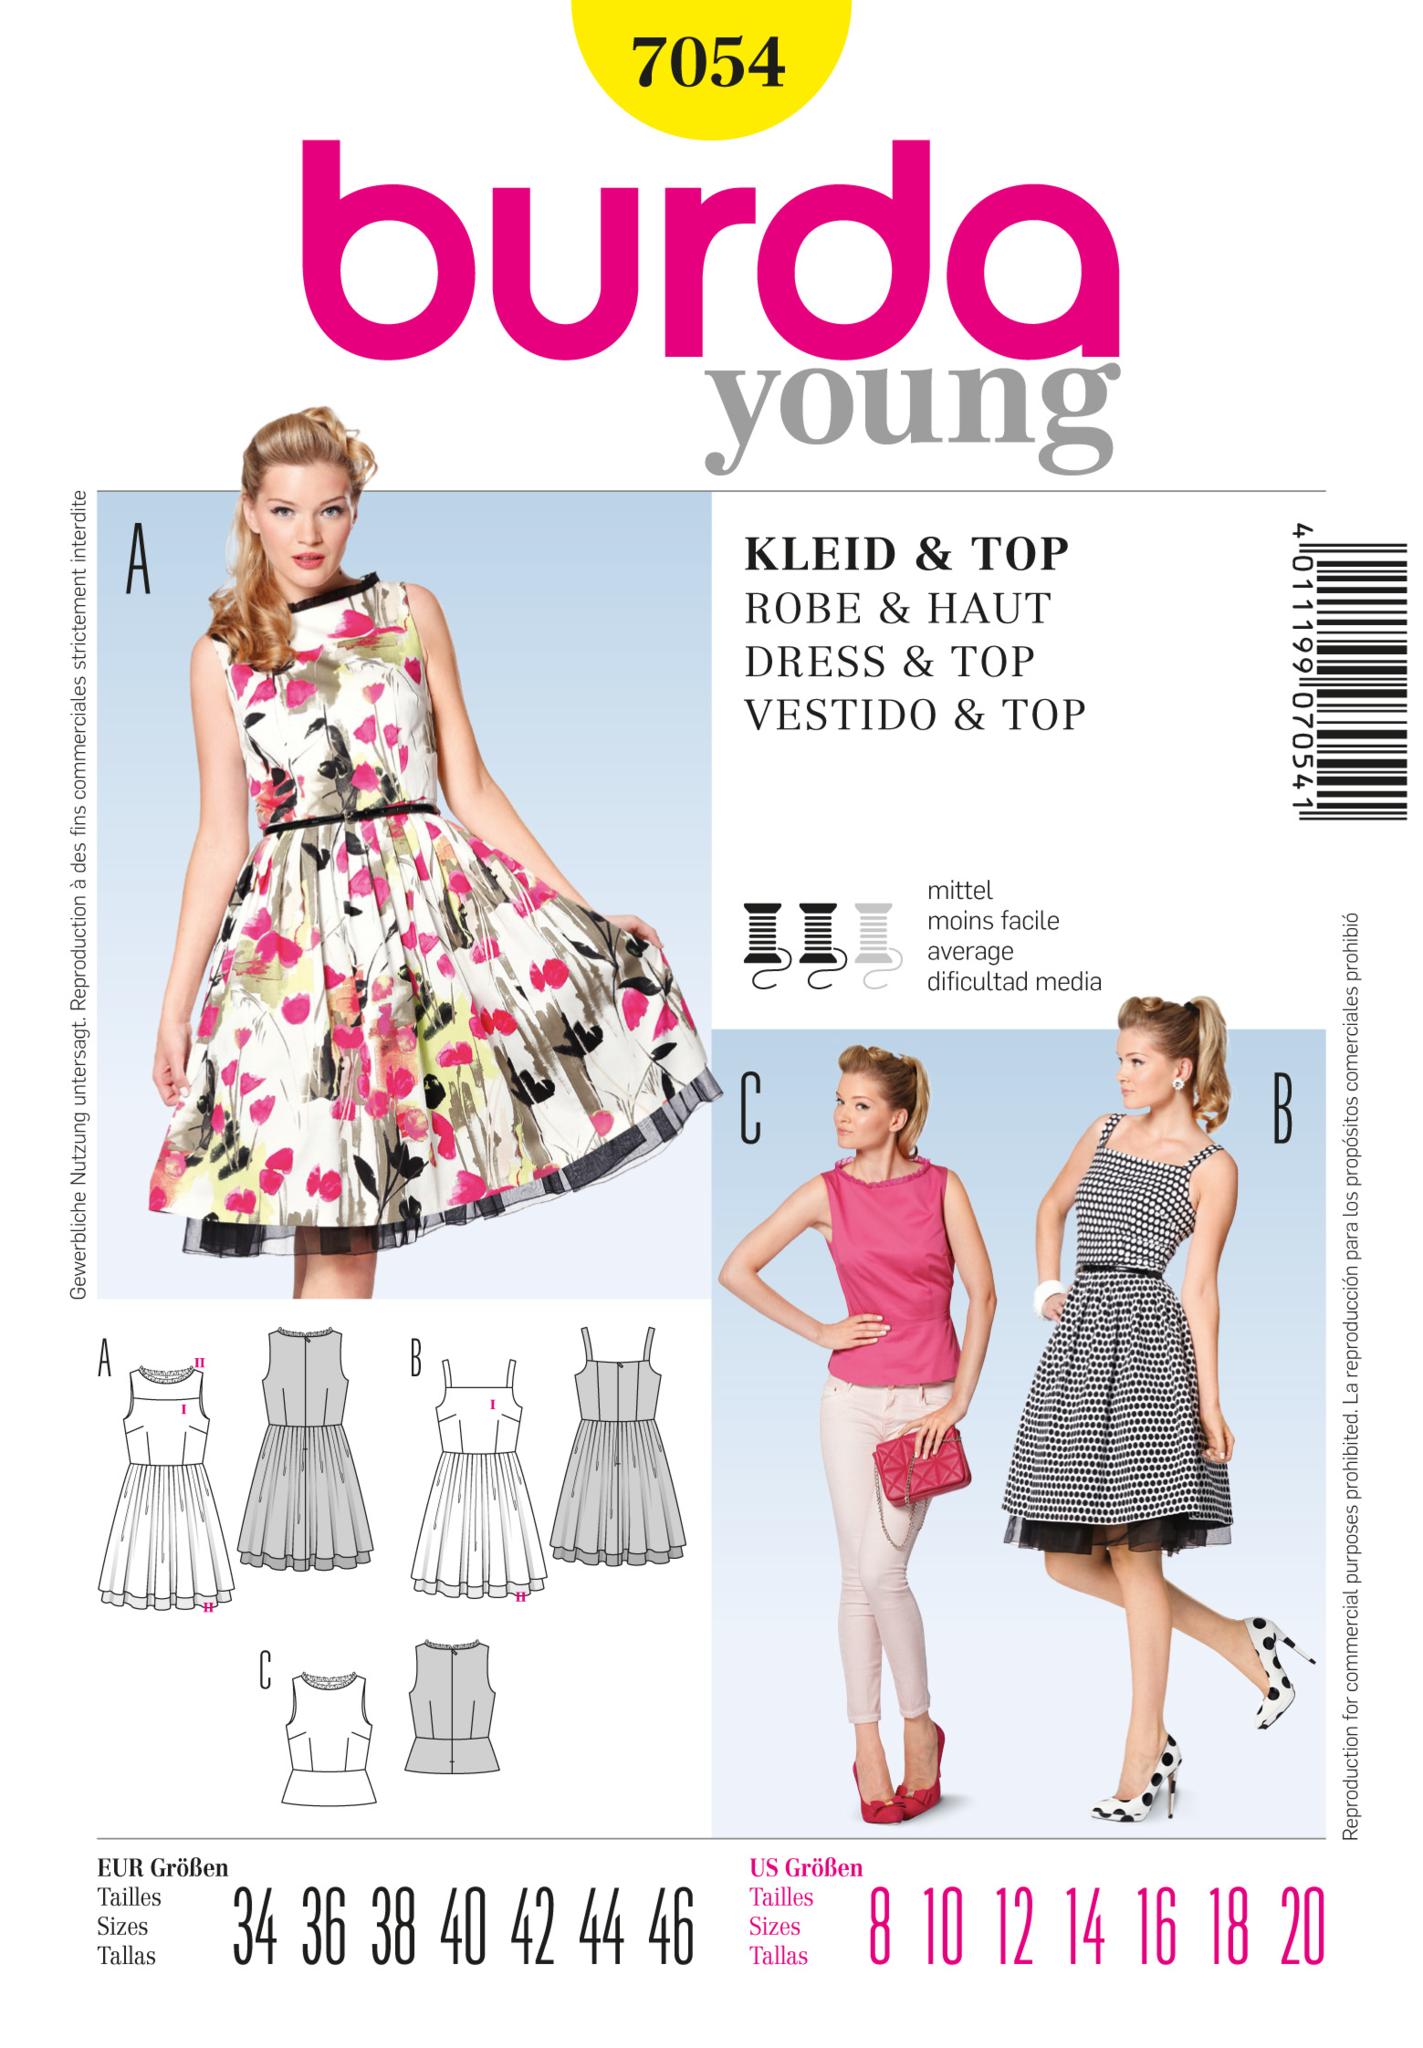 Burda pattern bd7054 misses dress top vintage jaycotts burda pattern bd7054 misses dress top vintage jaycotts jeuxipadfo Choice Image